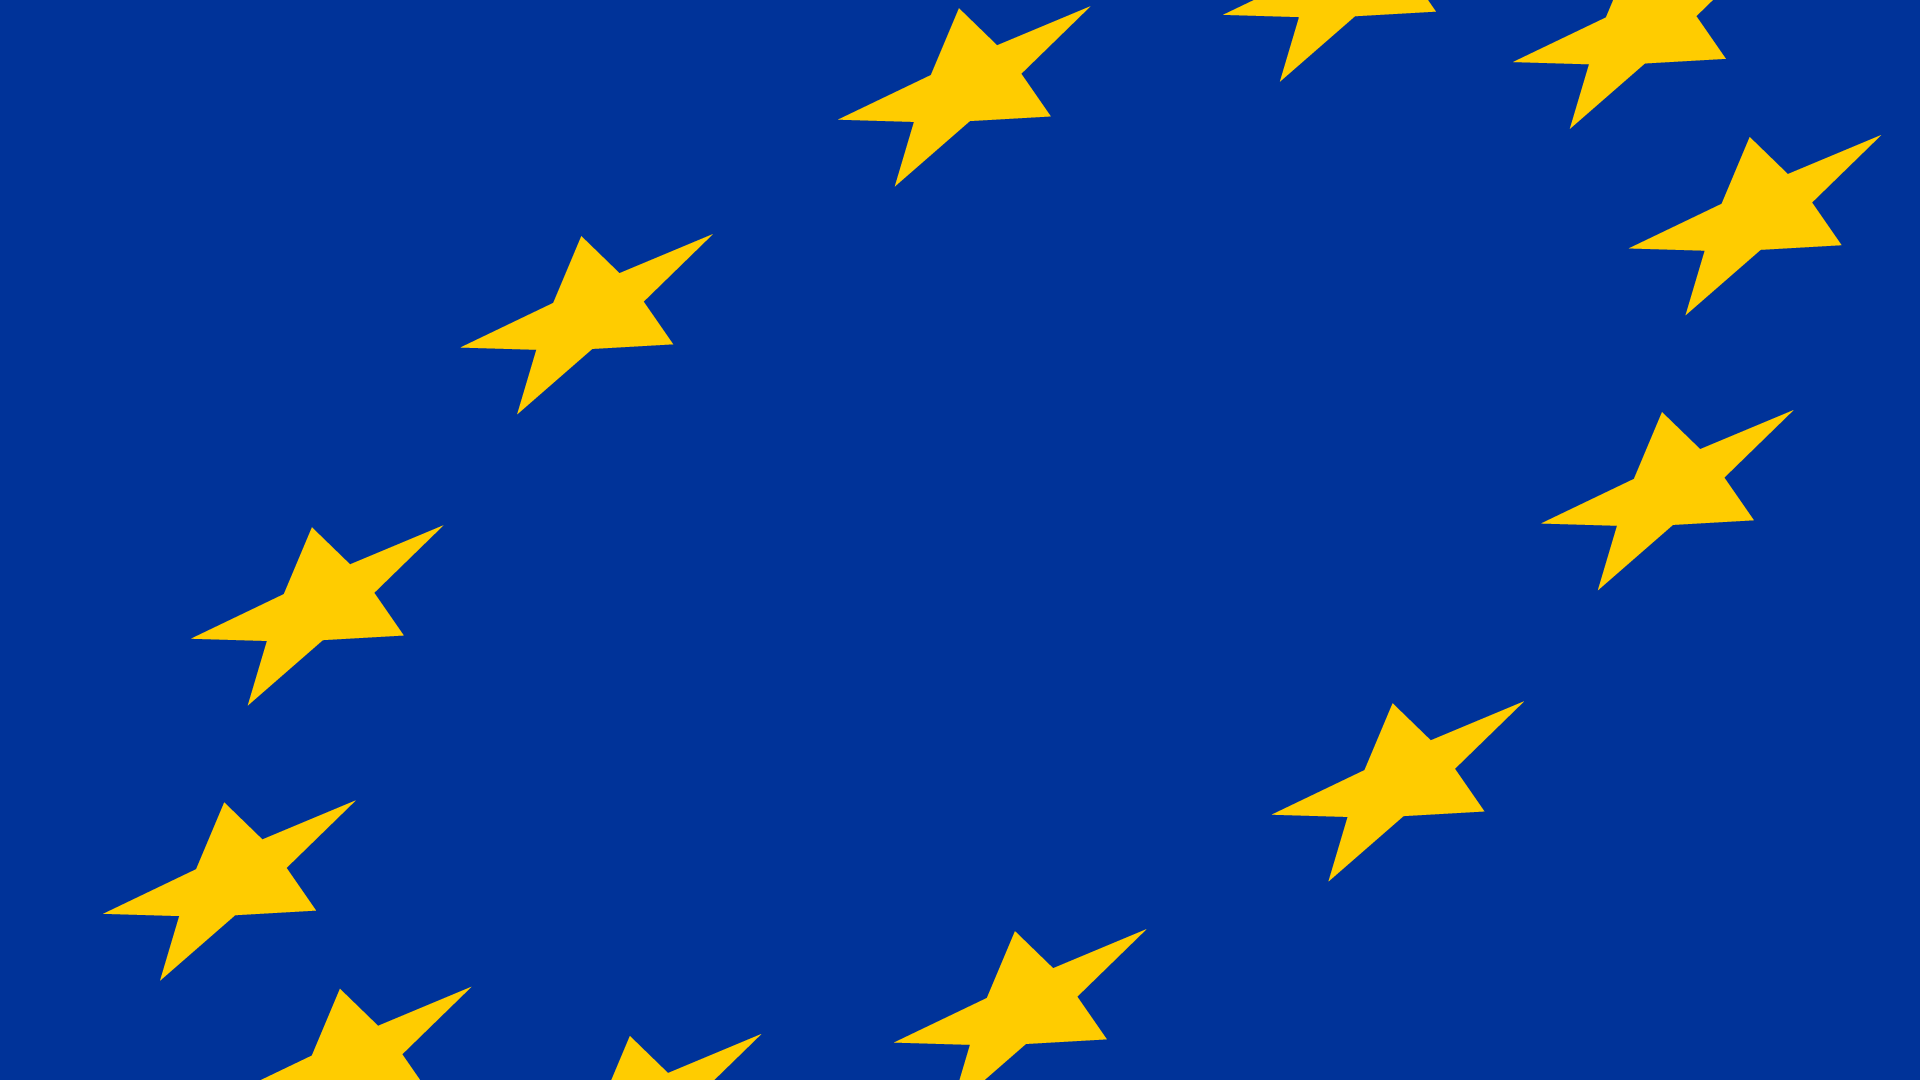 EU-Parlament beschließt Deckelung von Kreditkartengebühren